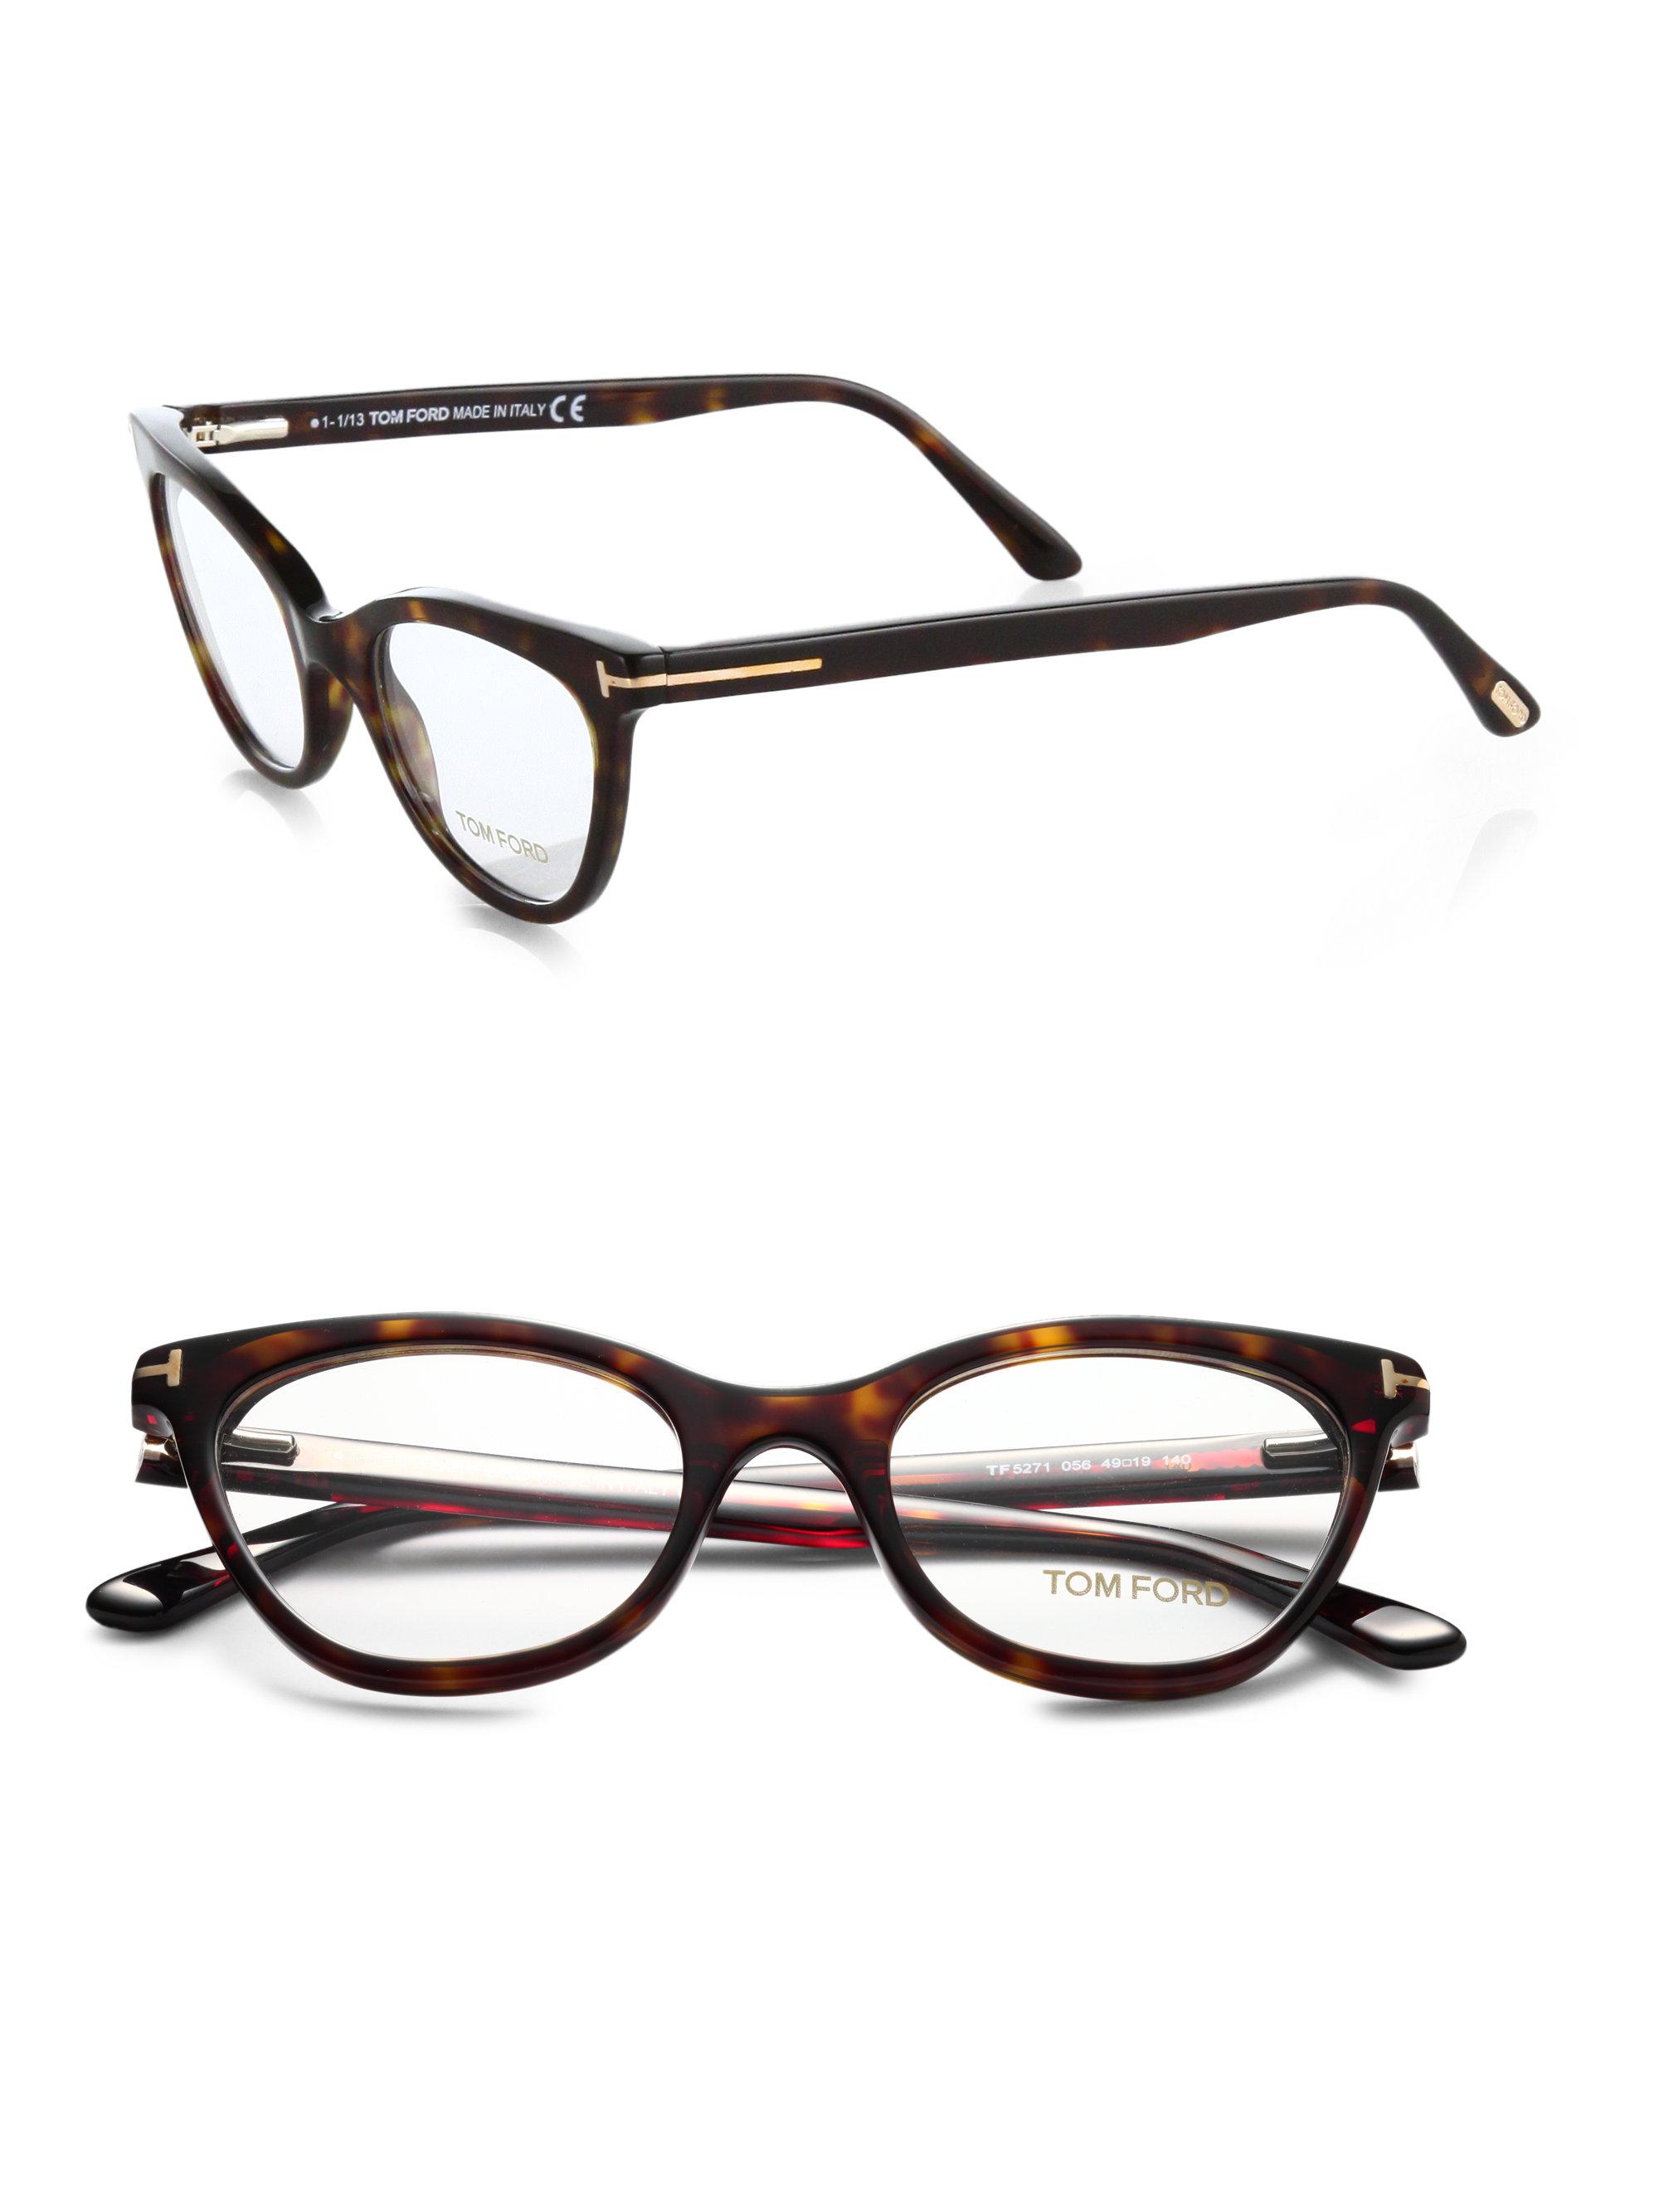 7412079a087 Cat Eye Glasses Tom Ford - Best Glasses Cnapracticetesting.Com 2018